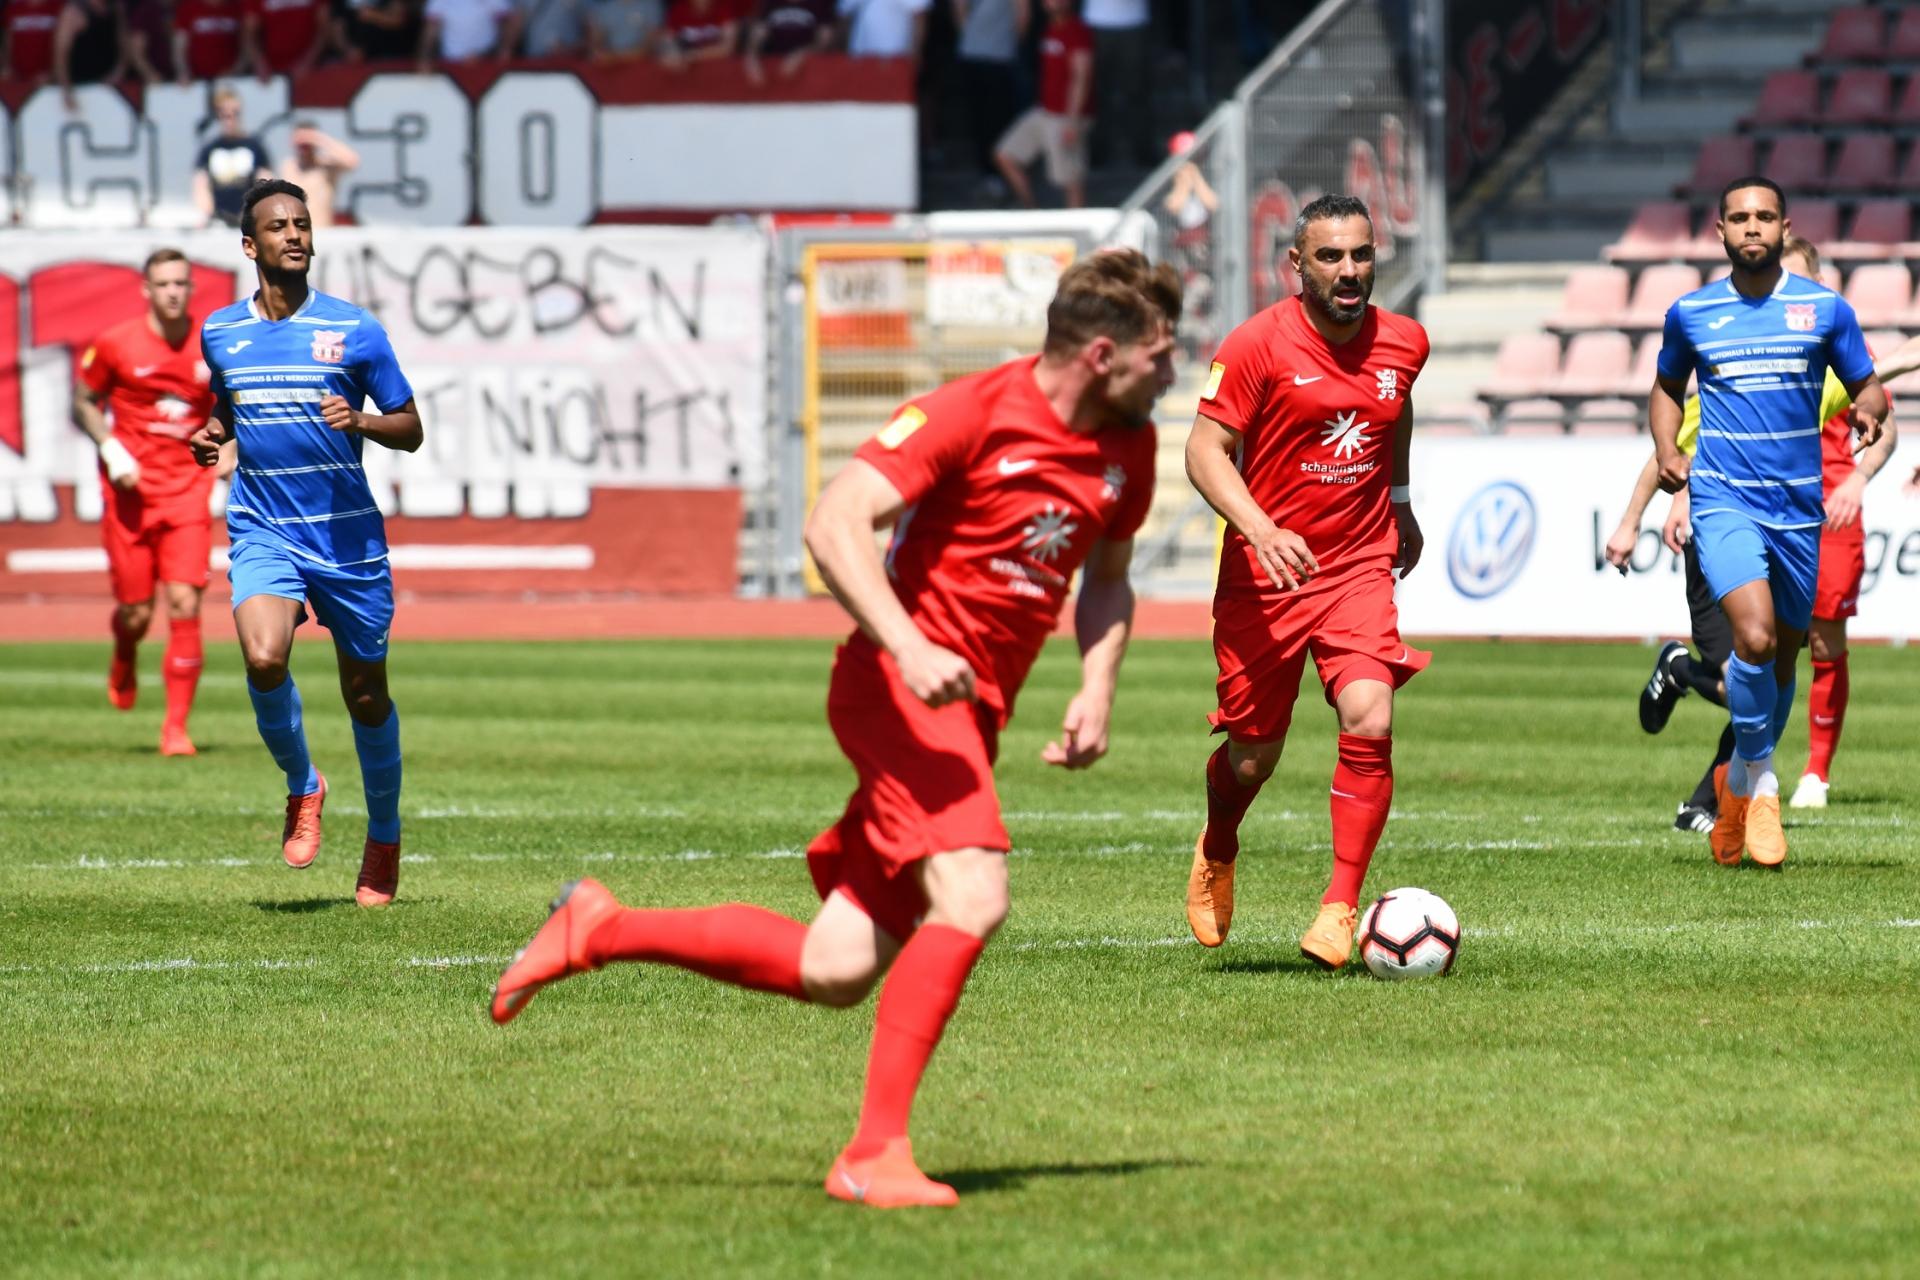 Lotto Hessenliga 2018/2019, KSV Hessen Kassel, T�rk G�c� Friedberg, Endstand 4:0, Mahir Sagl�k (KSV Hessen Kassel)